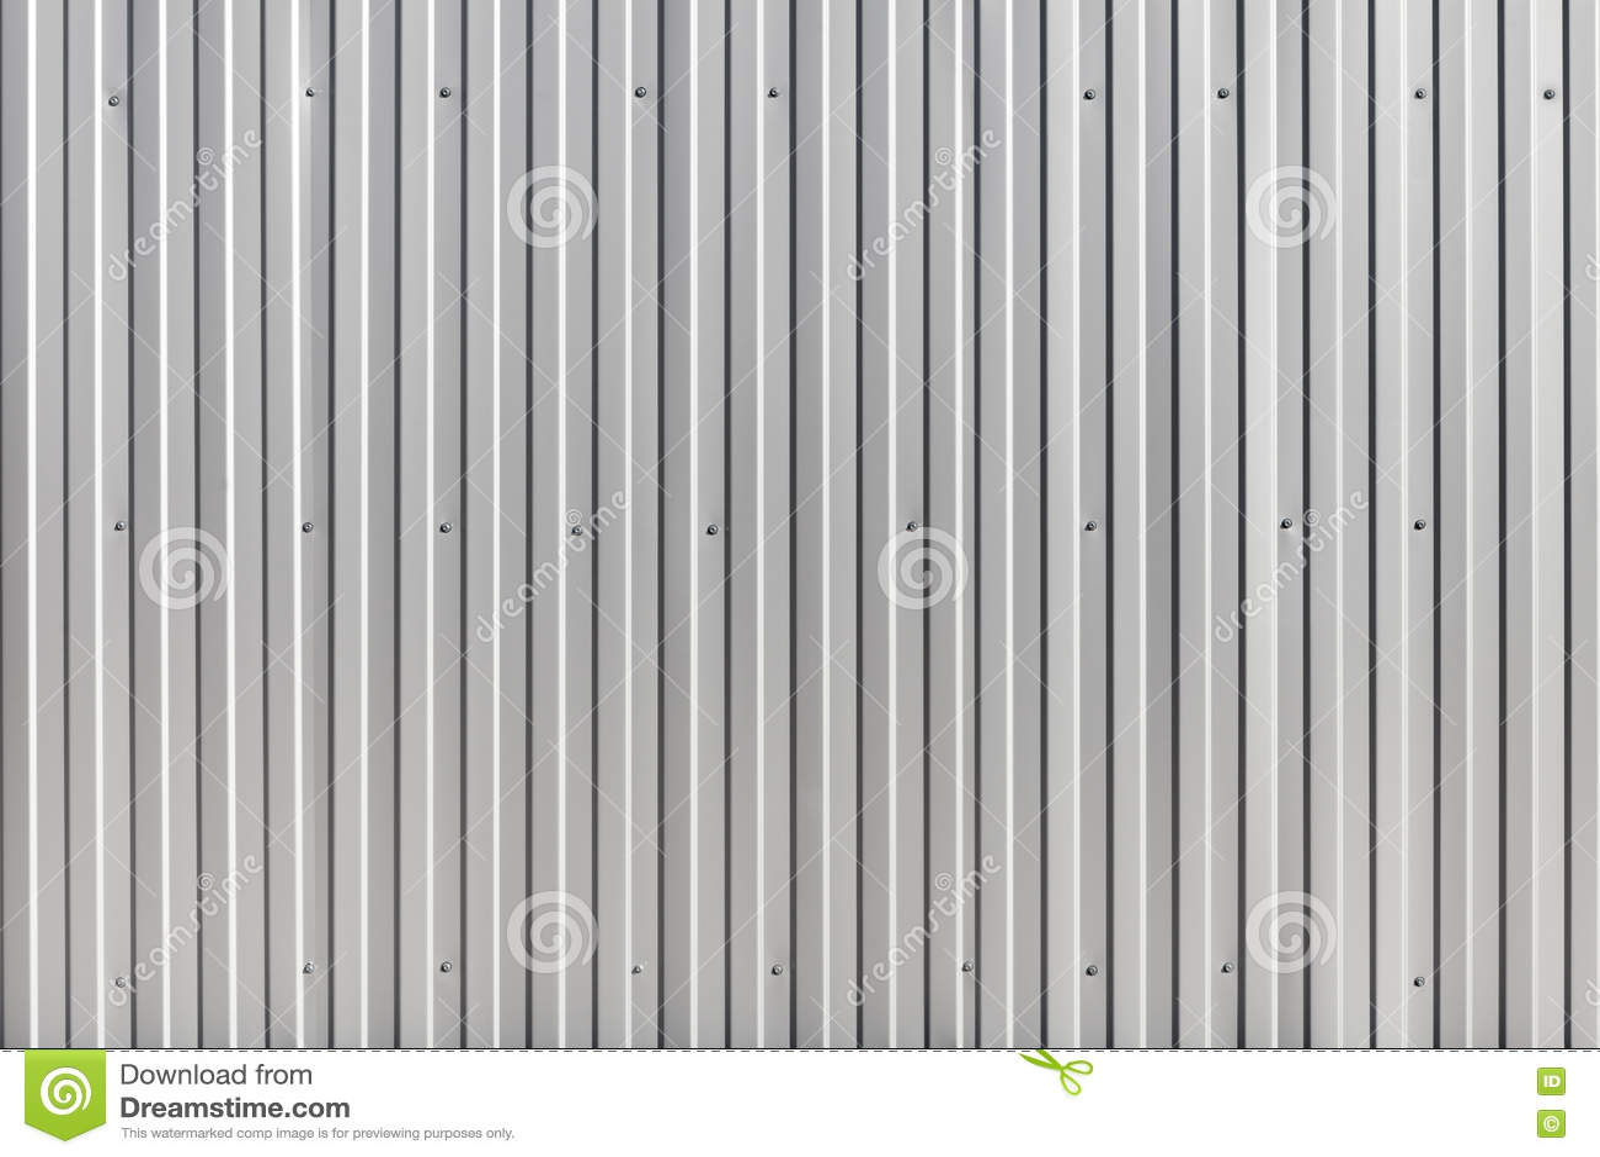 Corrugated Metal Walls corrugated metal wall, metal construction fence. stock photo